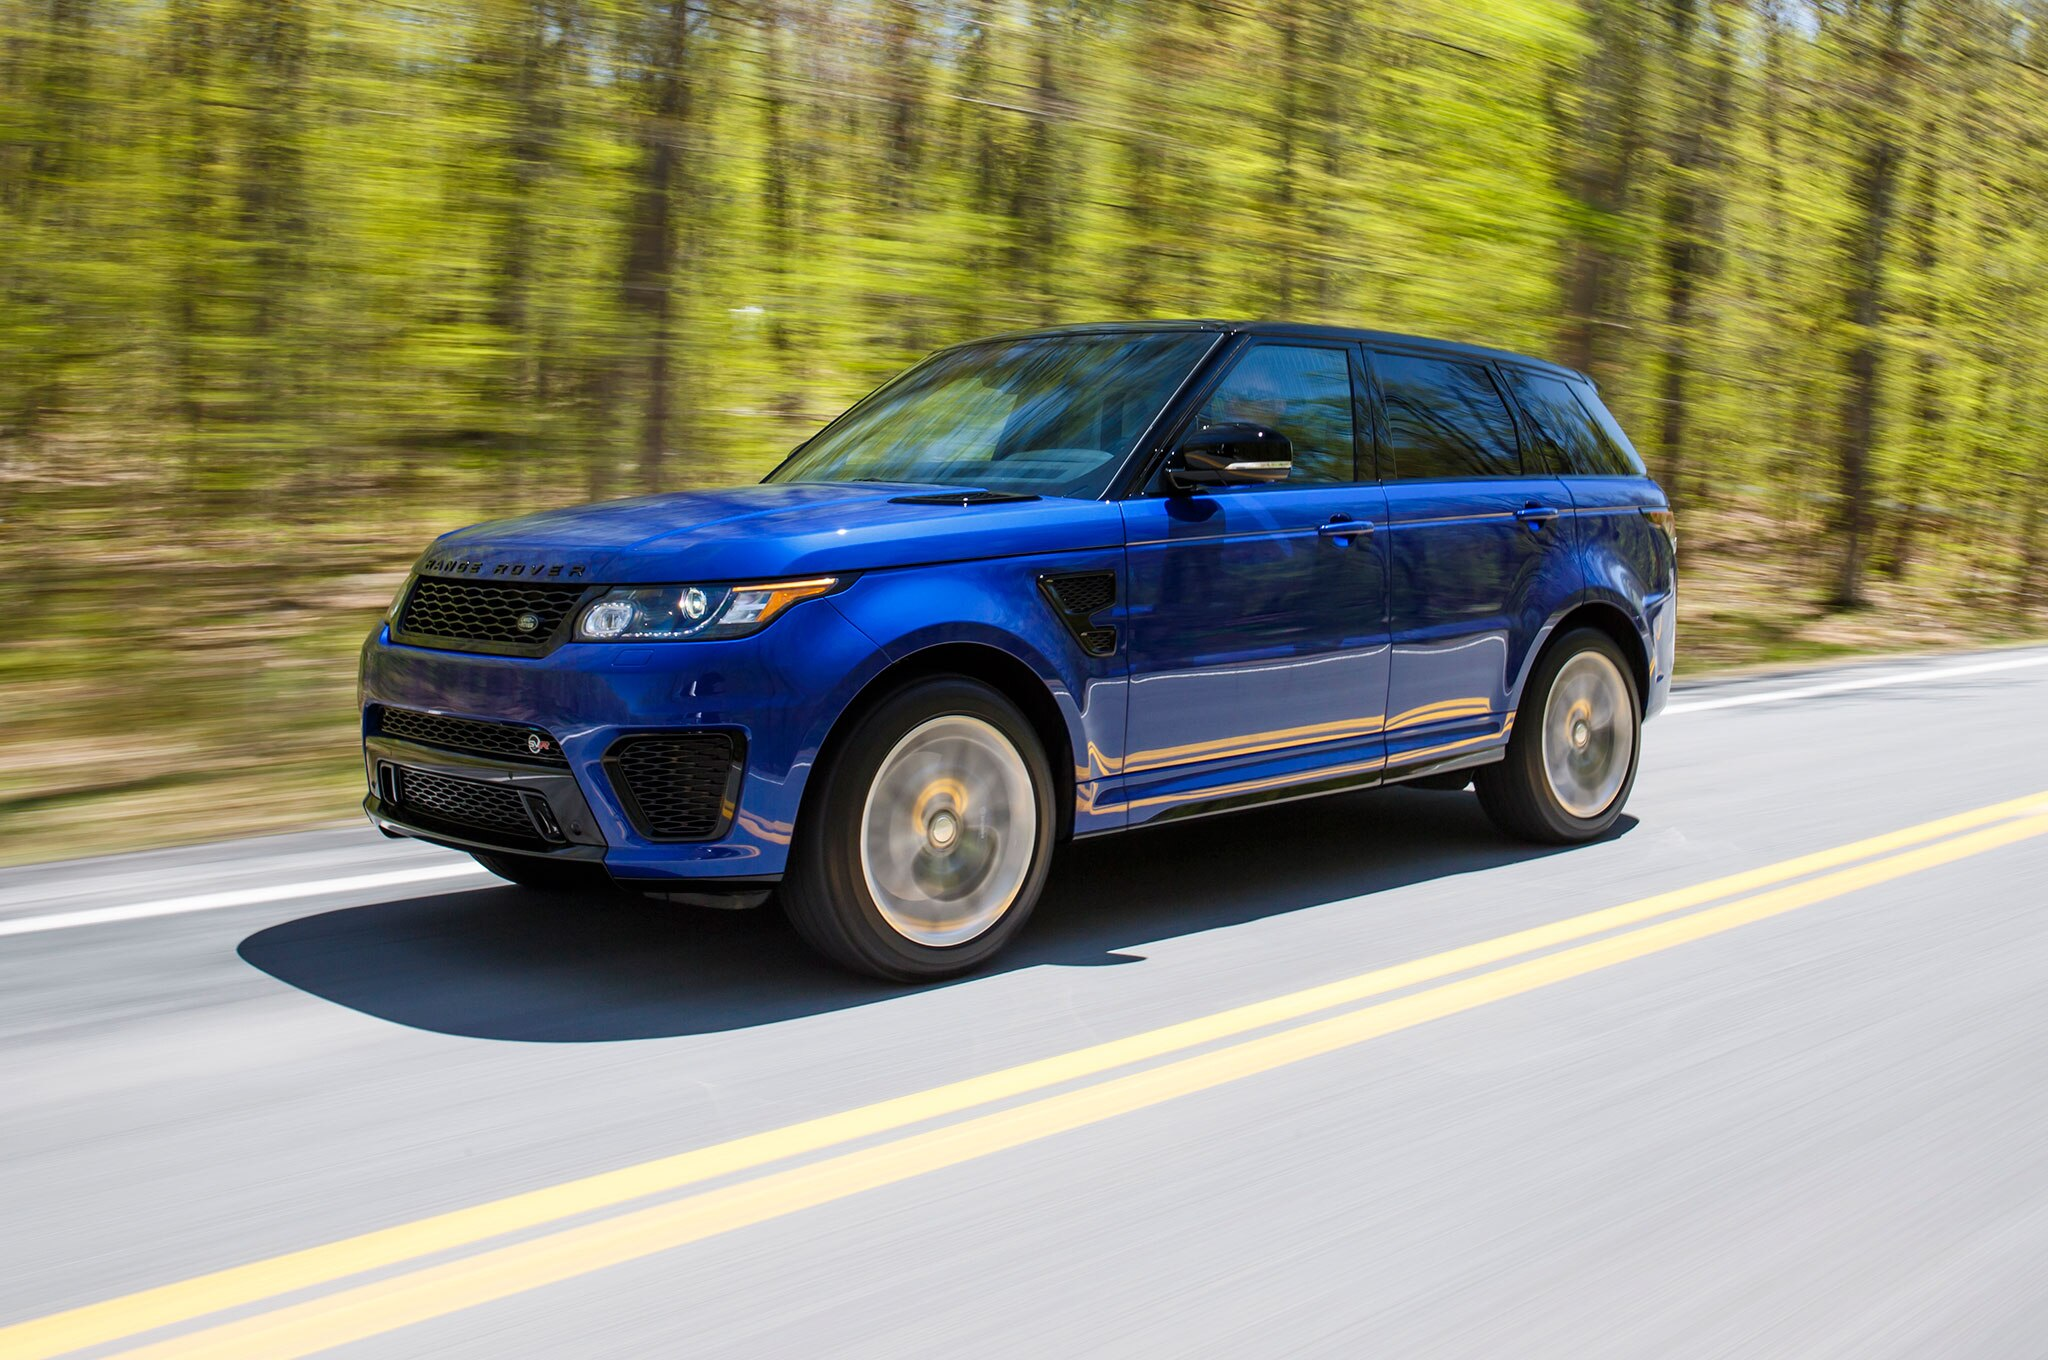 2015 Range Rover Sport SVR Front Three Quarter Motion 11